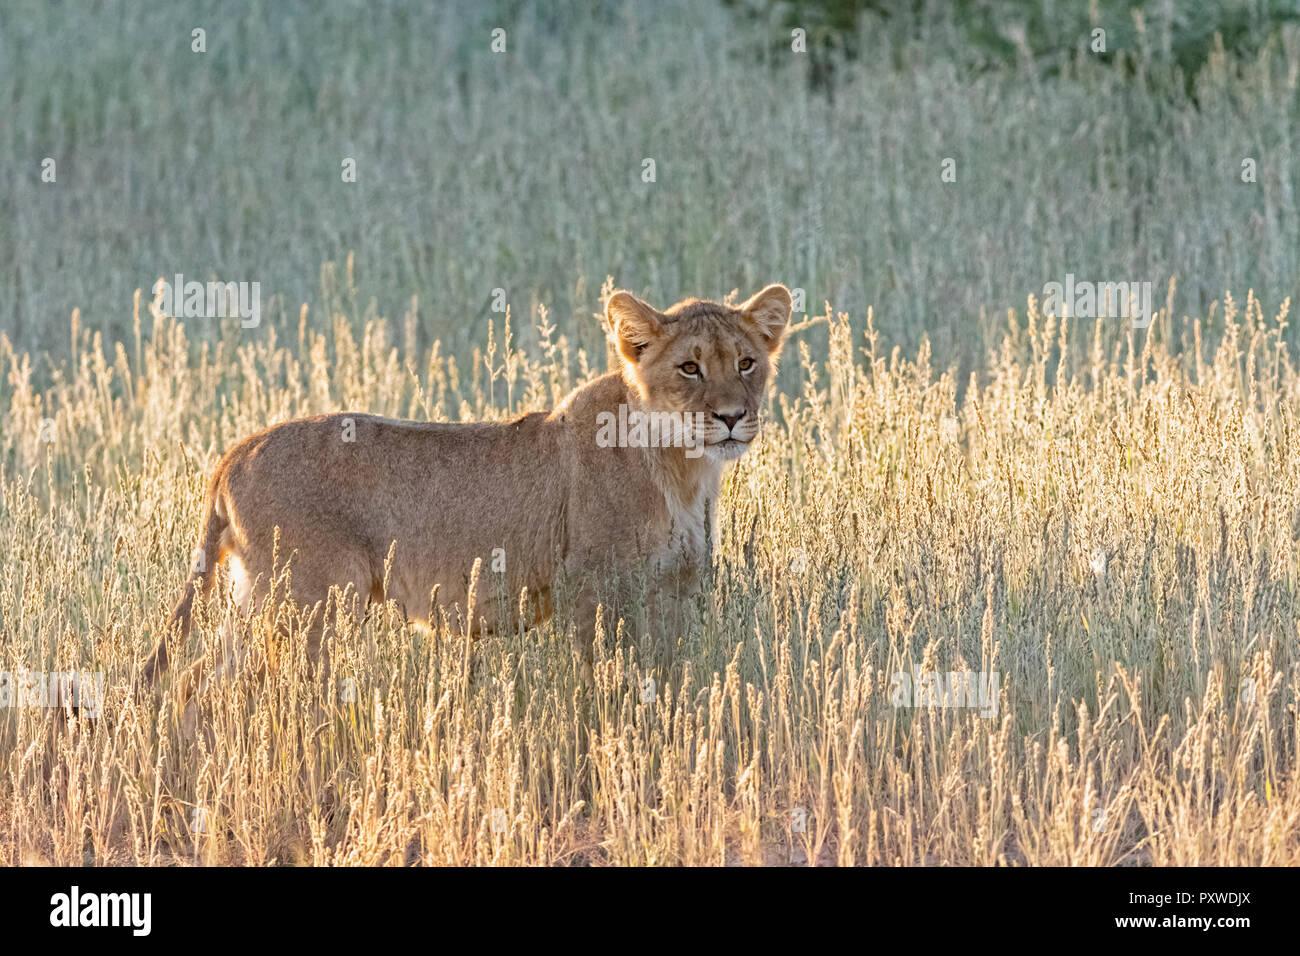 Botswana, Kgalagadi Transfrontier Park, lion, Panthera leo - Stock Image